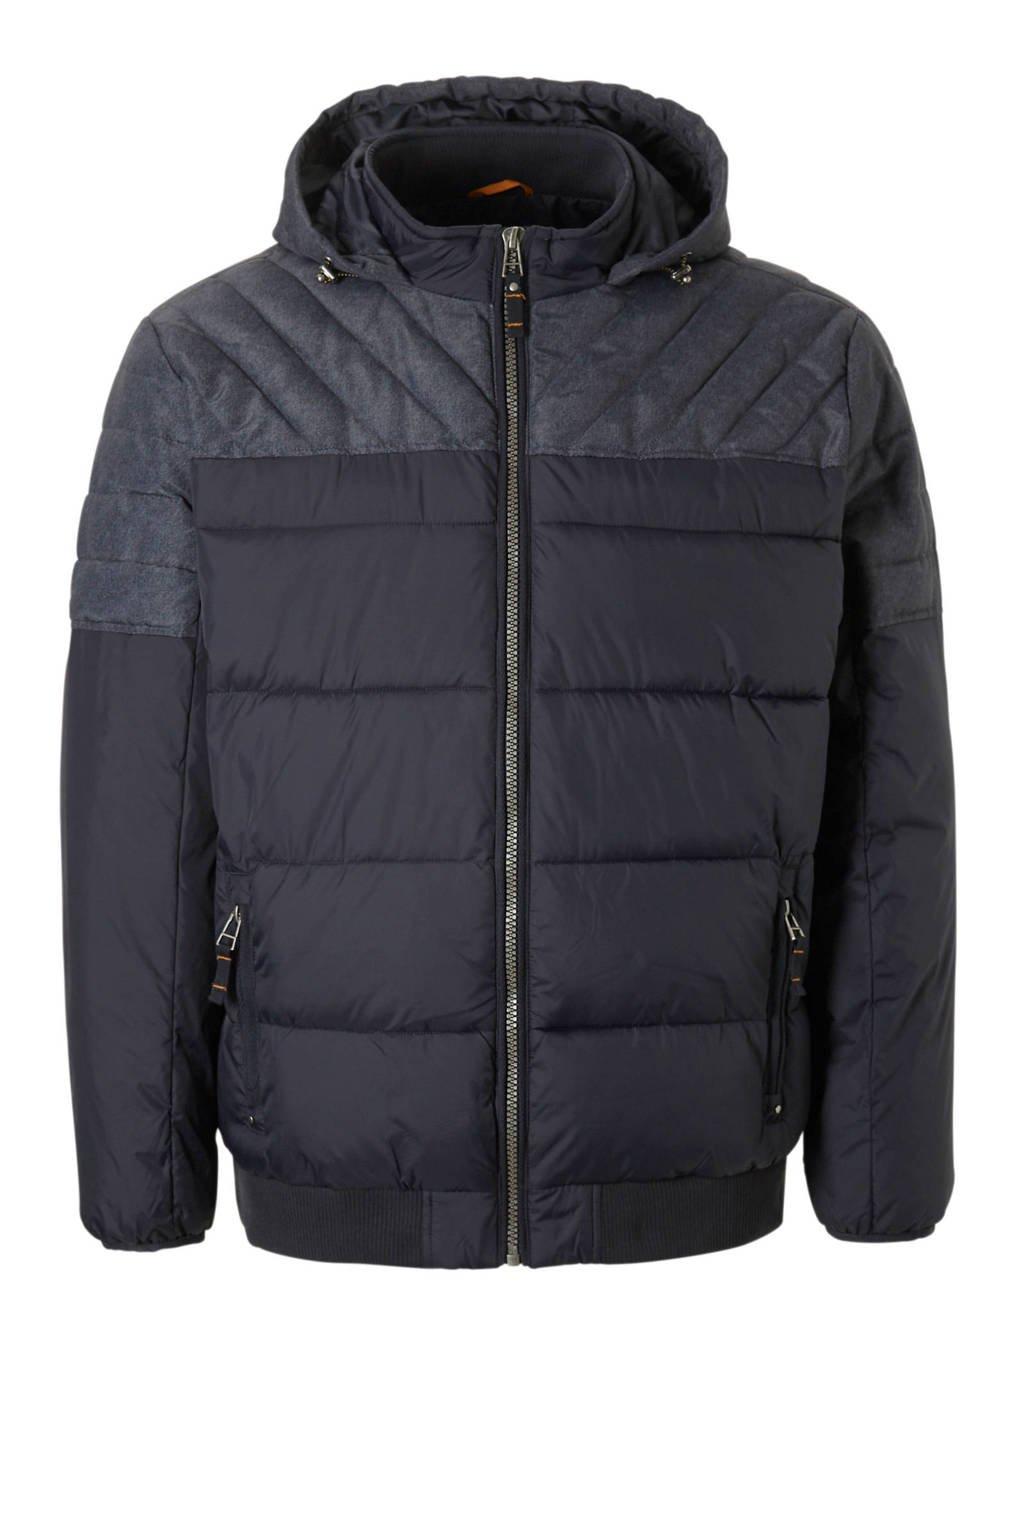 C&A XL Canda winterjas donkerblauw, Donkerblauw